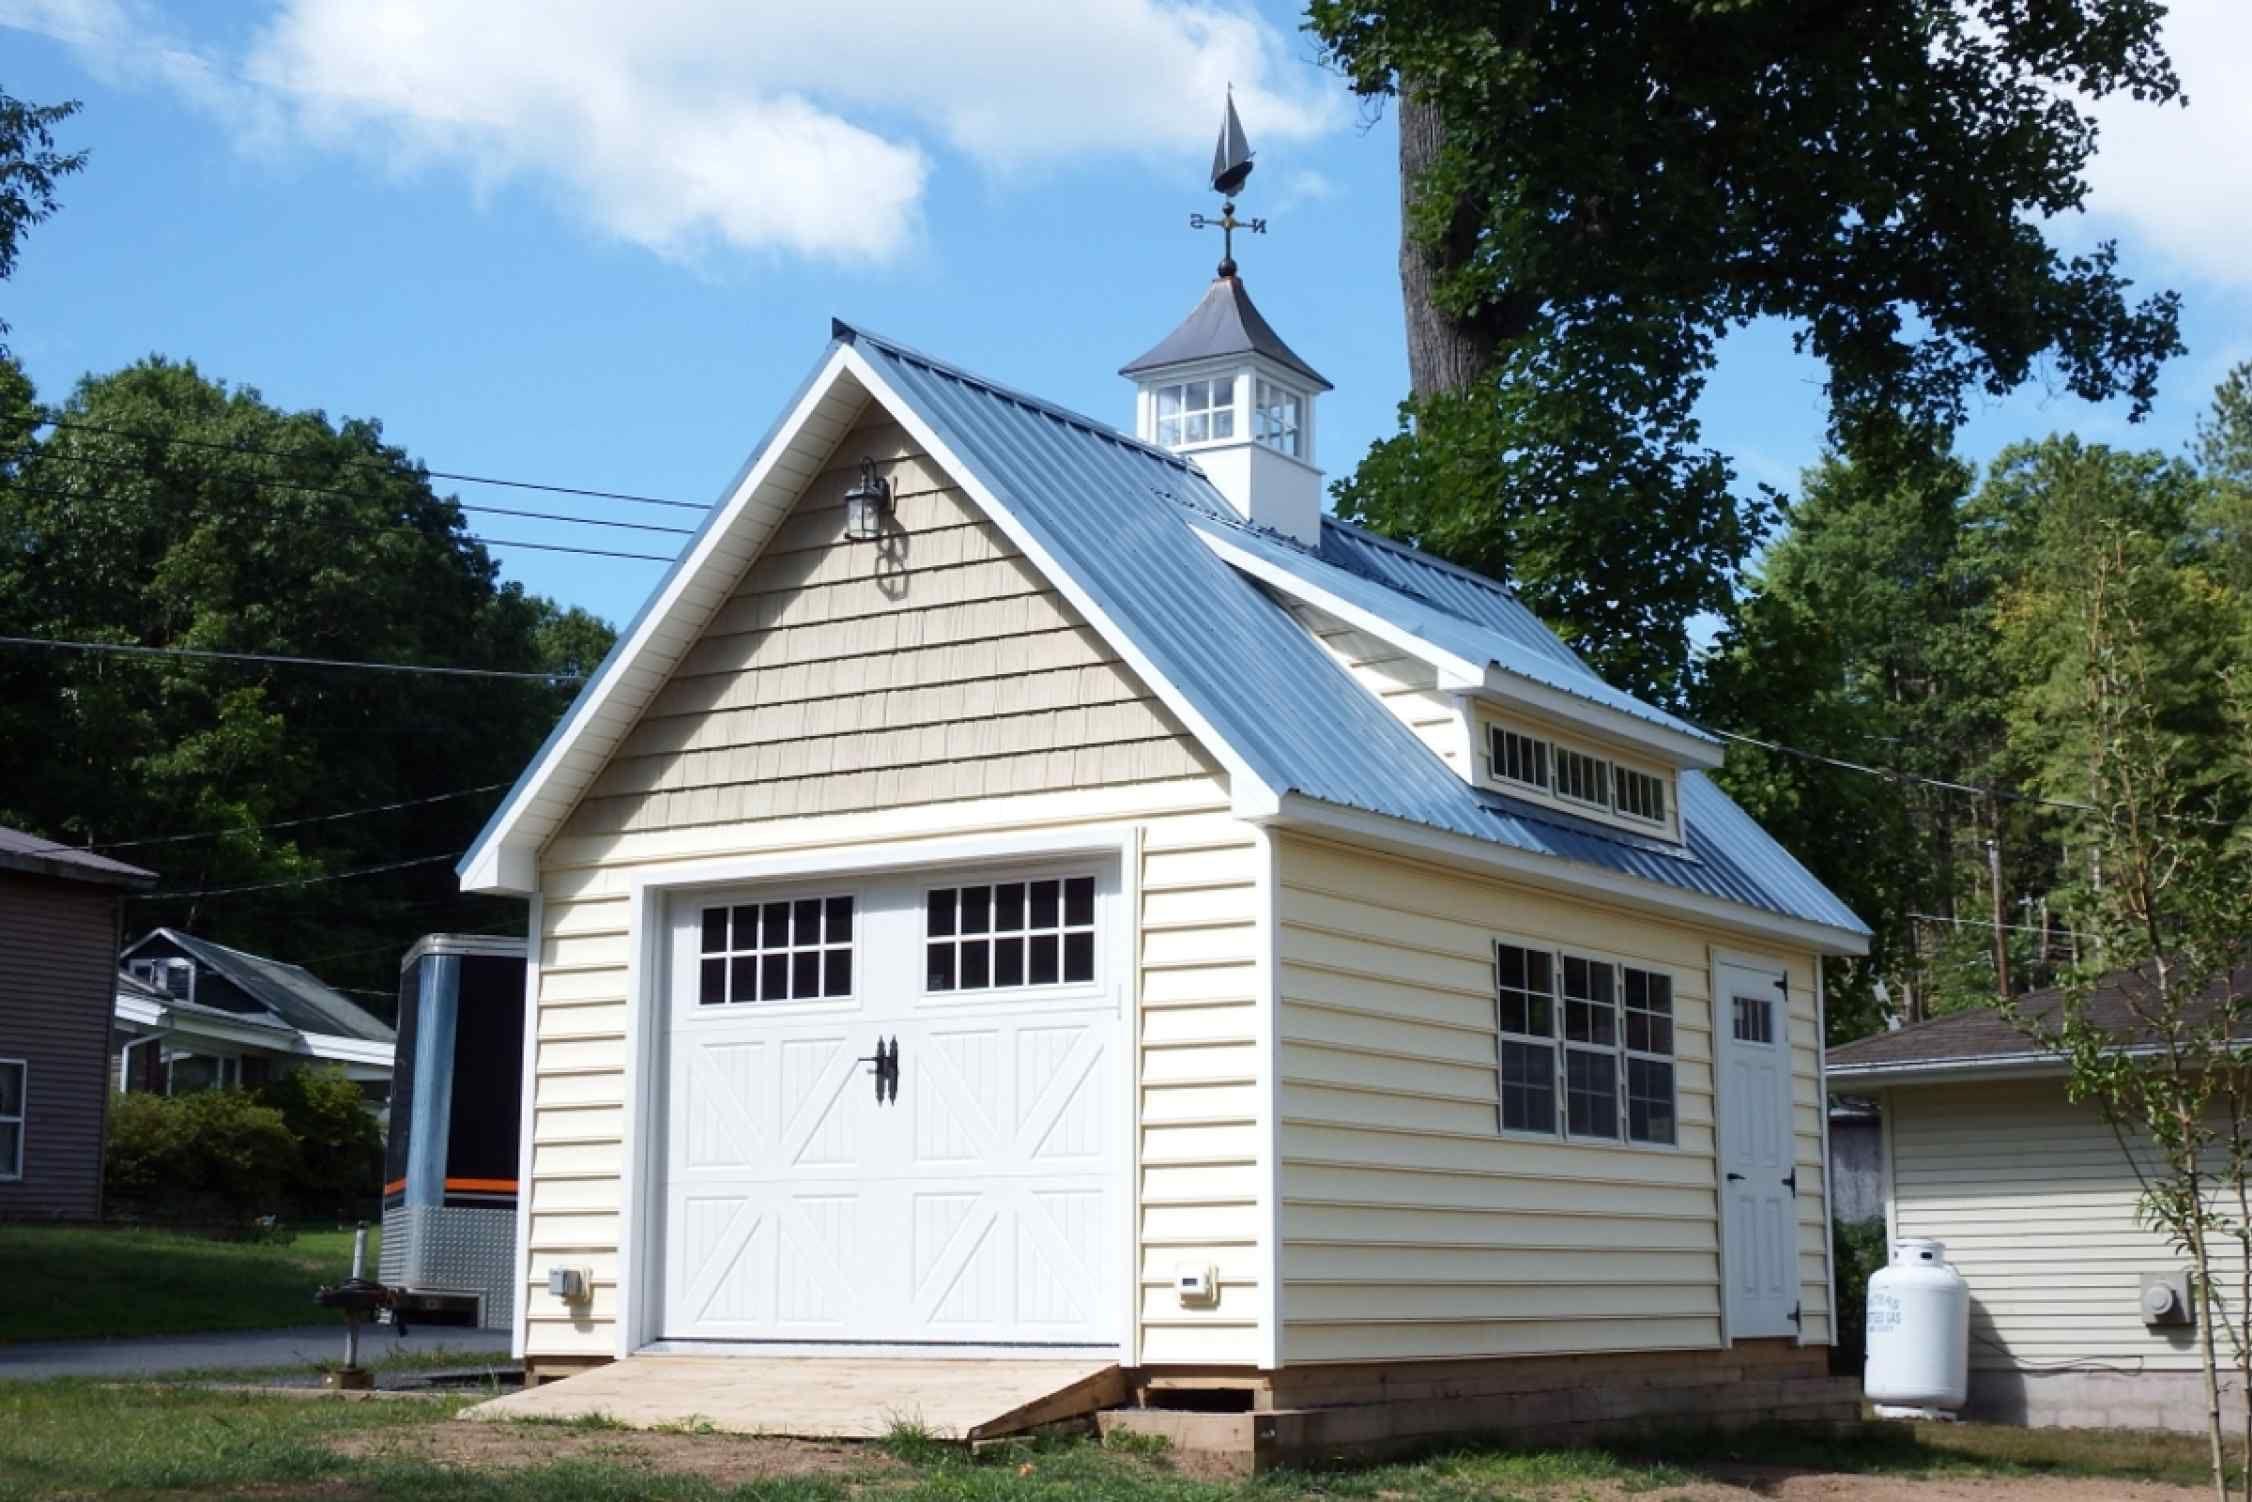 14x20 Colonial Barn, Vinyl siding, Metal roof, 3 transom dormer